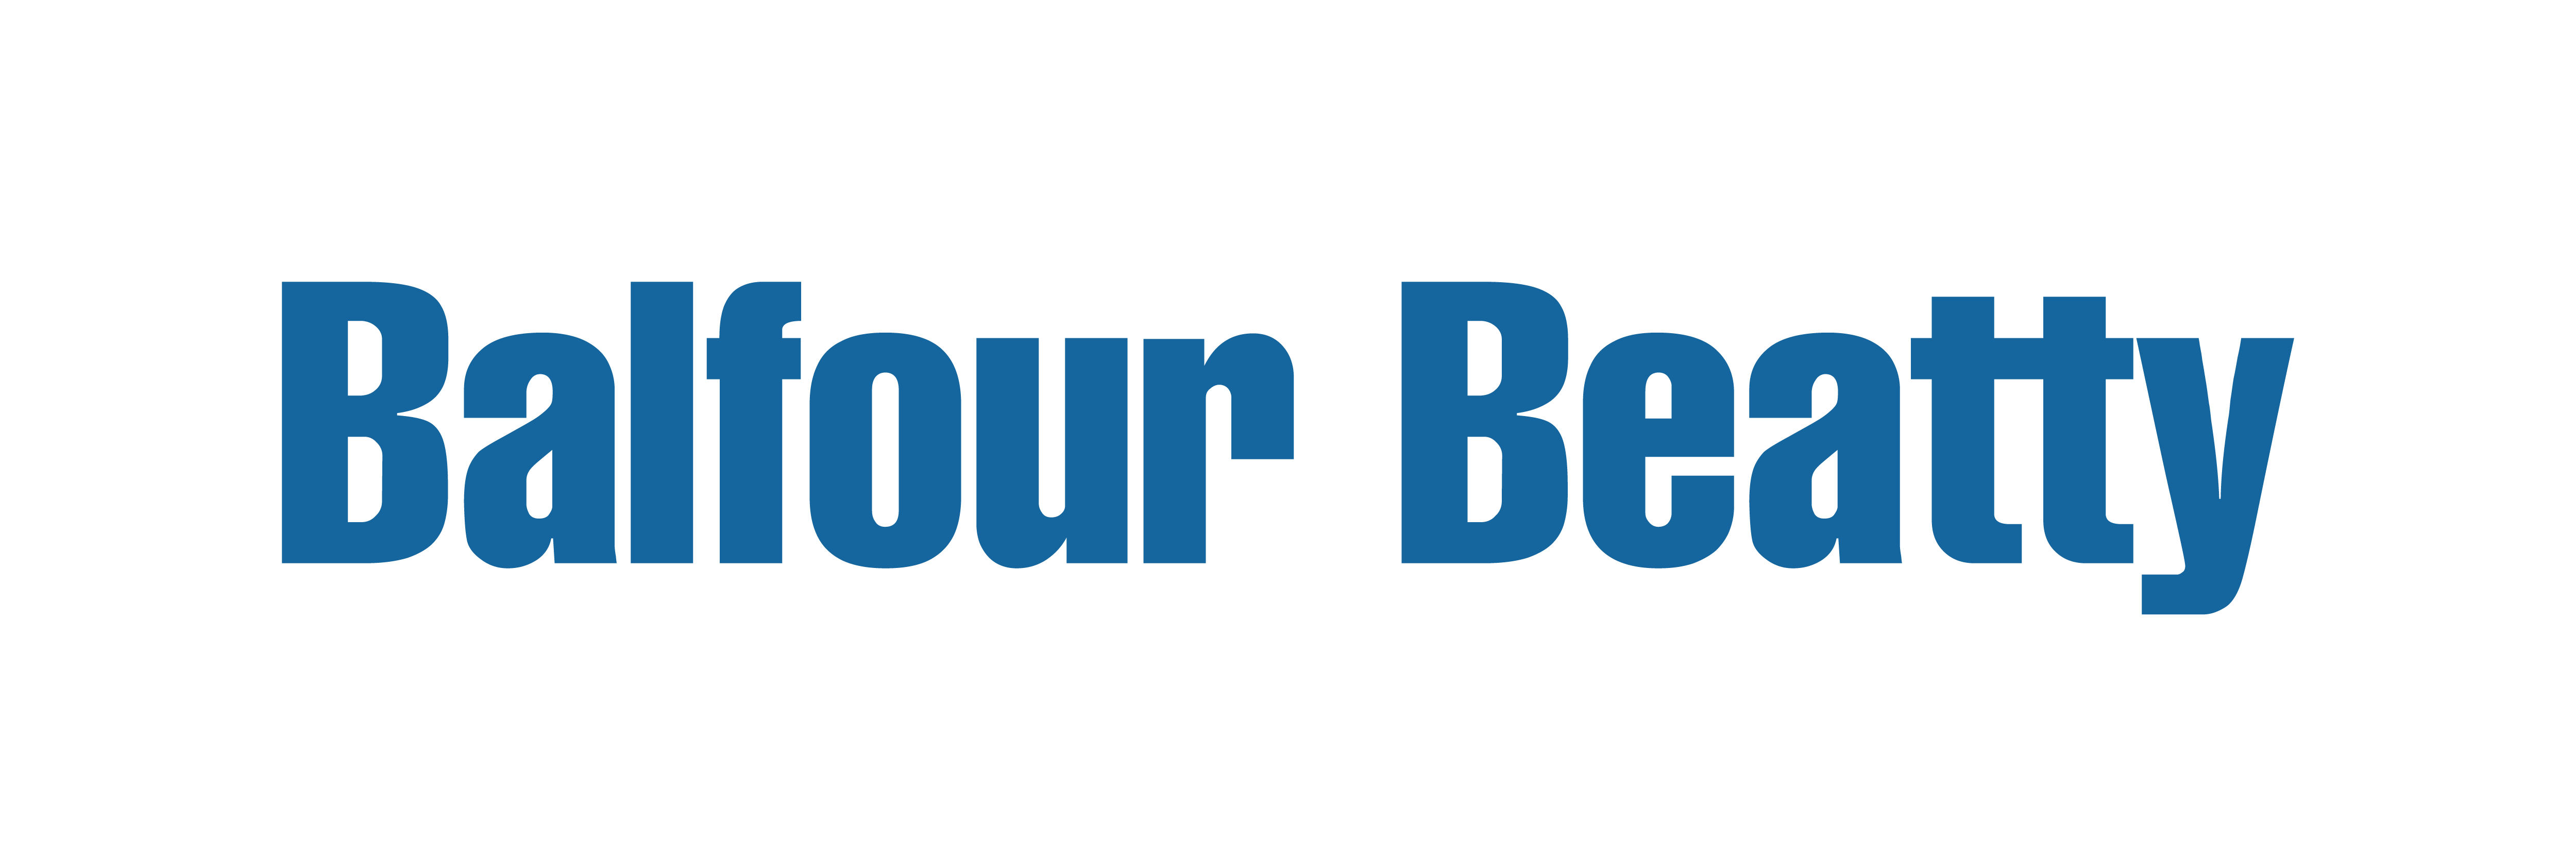 https://growthzonesitesprod.azureedge.net/wp-content/uploads/sites/1496/2021/03/Balfour_Beatty_logo.png